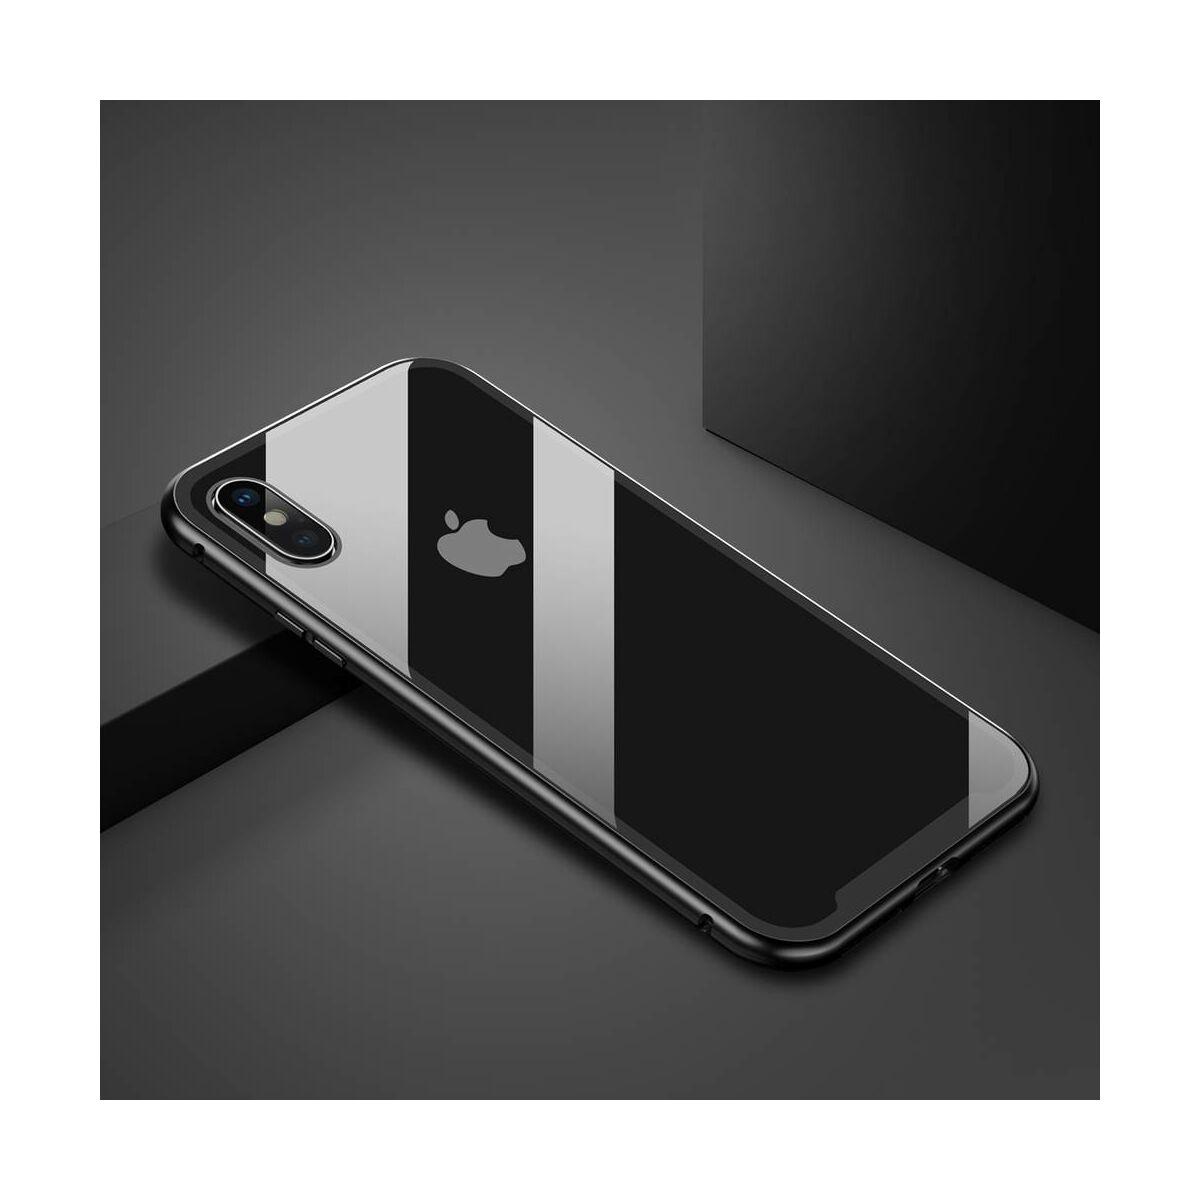 Baseus iPhone X/XS tok, Magnetite hardware, mágneses, fekete (WIAPIPHX-CS01)